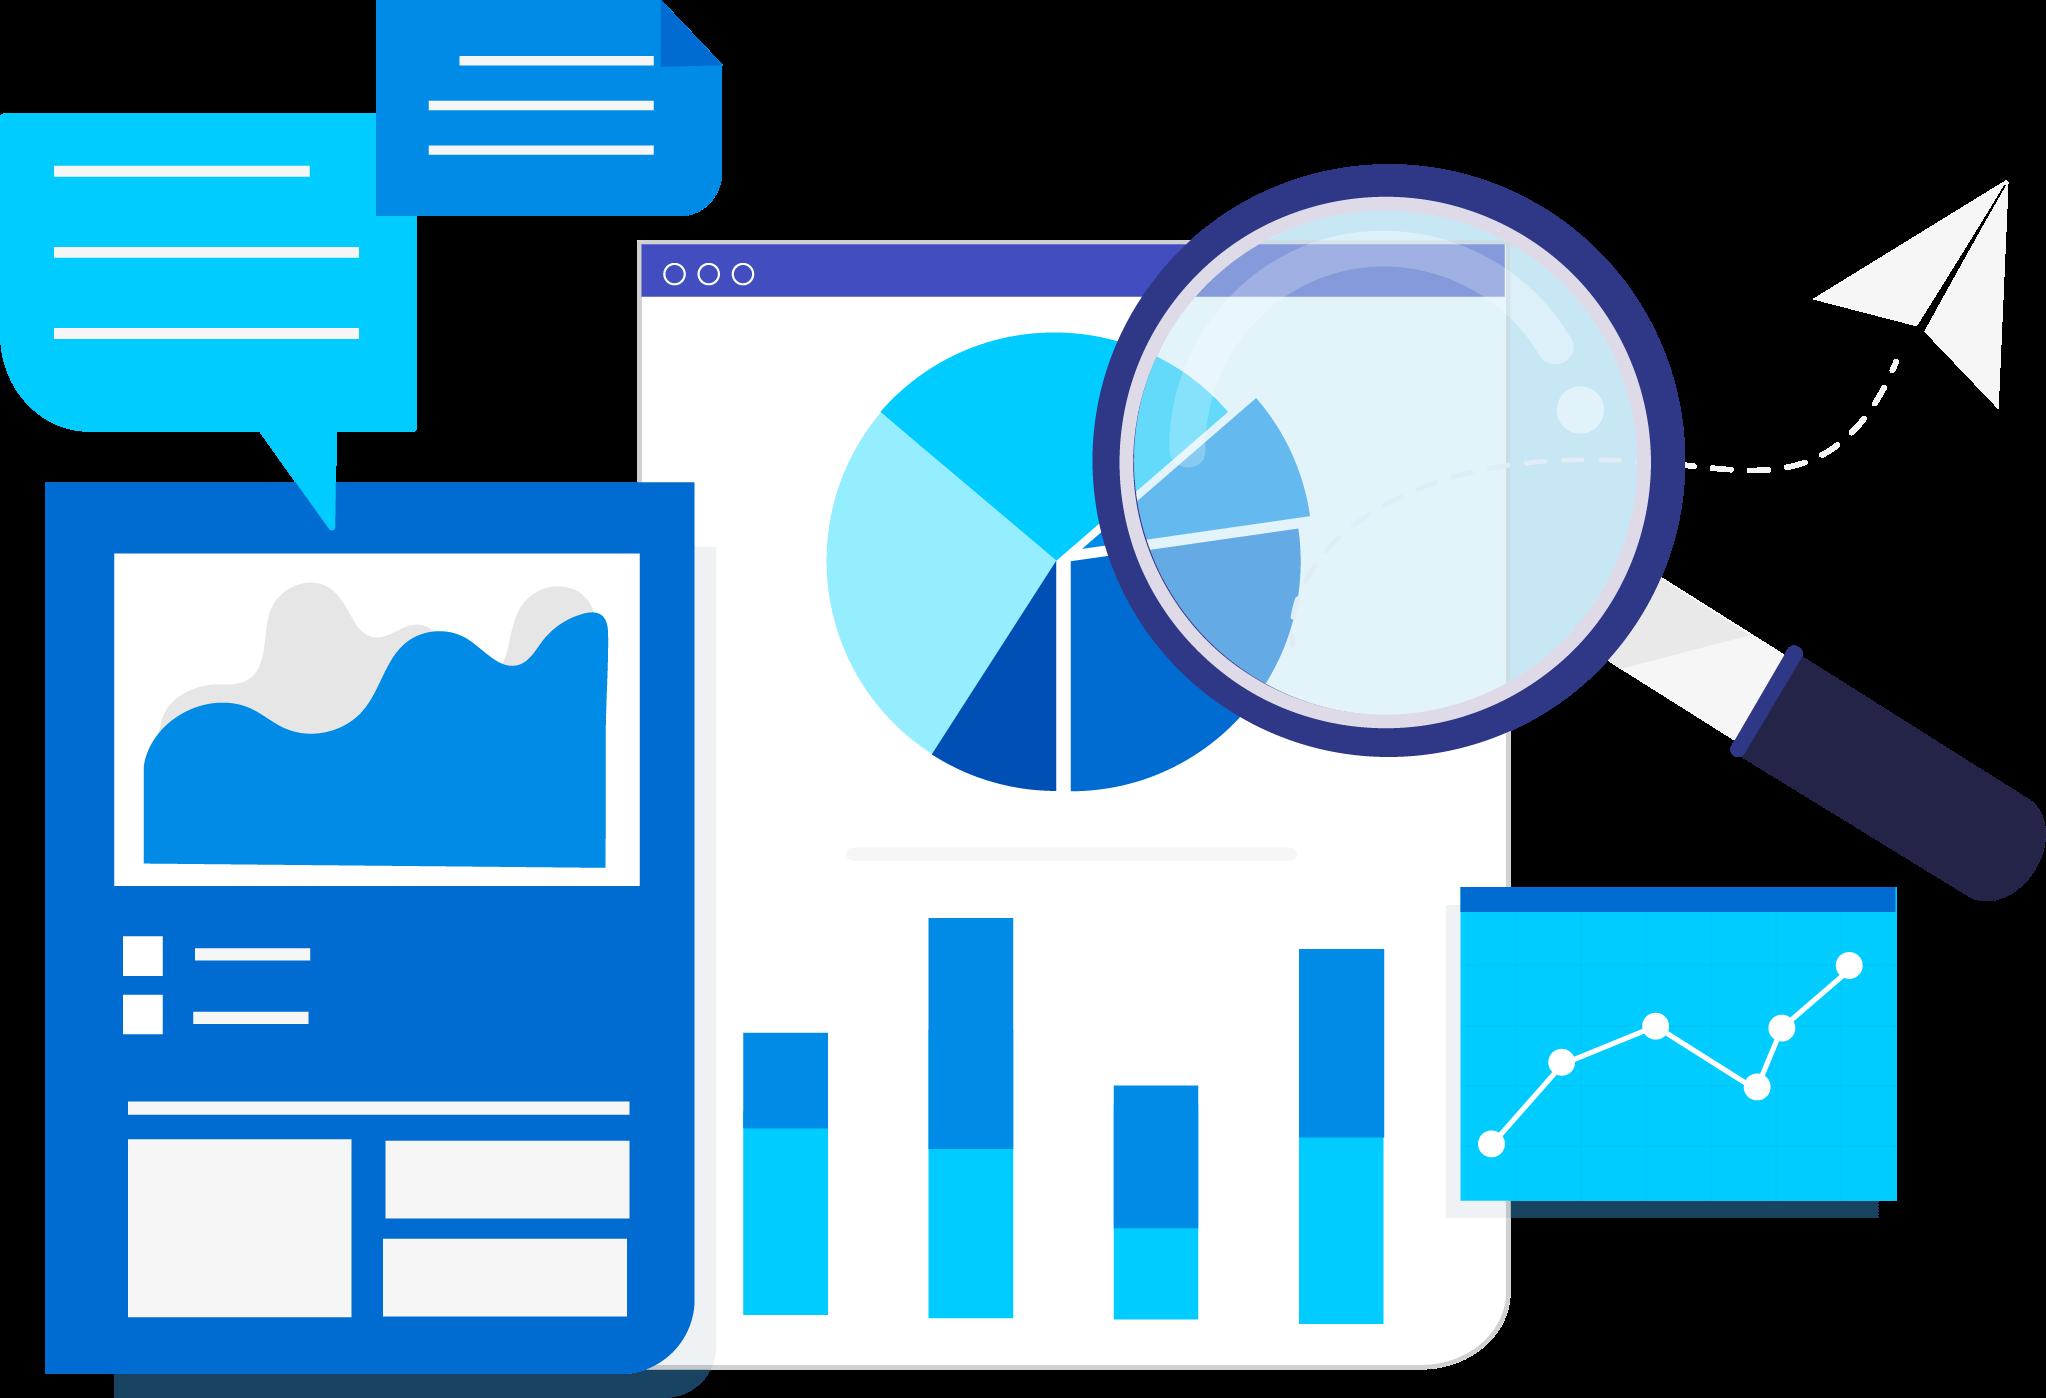 SKAdNetwork conversion reporting through the Kochava dashboard